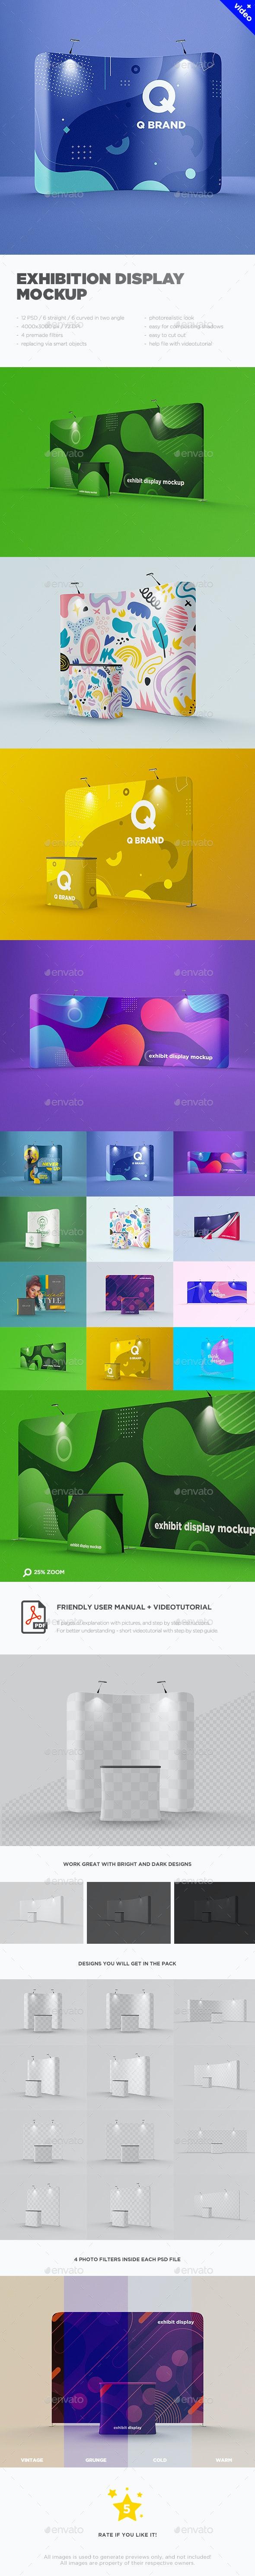 Exhibition Display Mockup - Miscellaneous Print